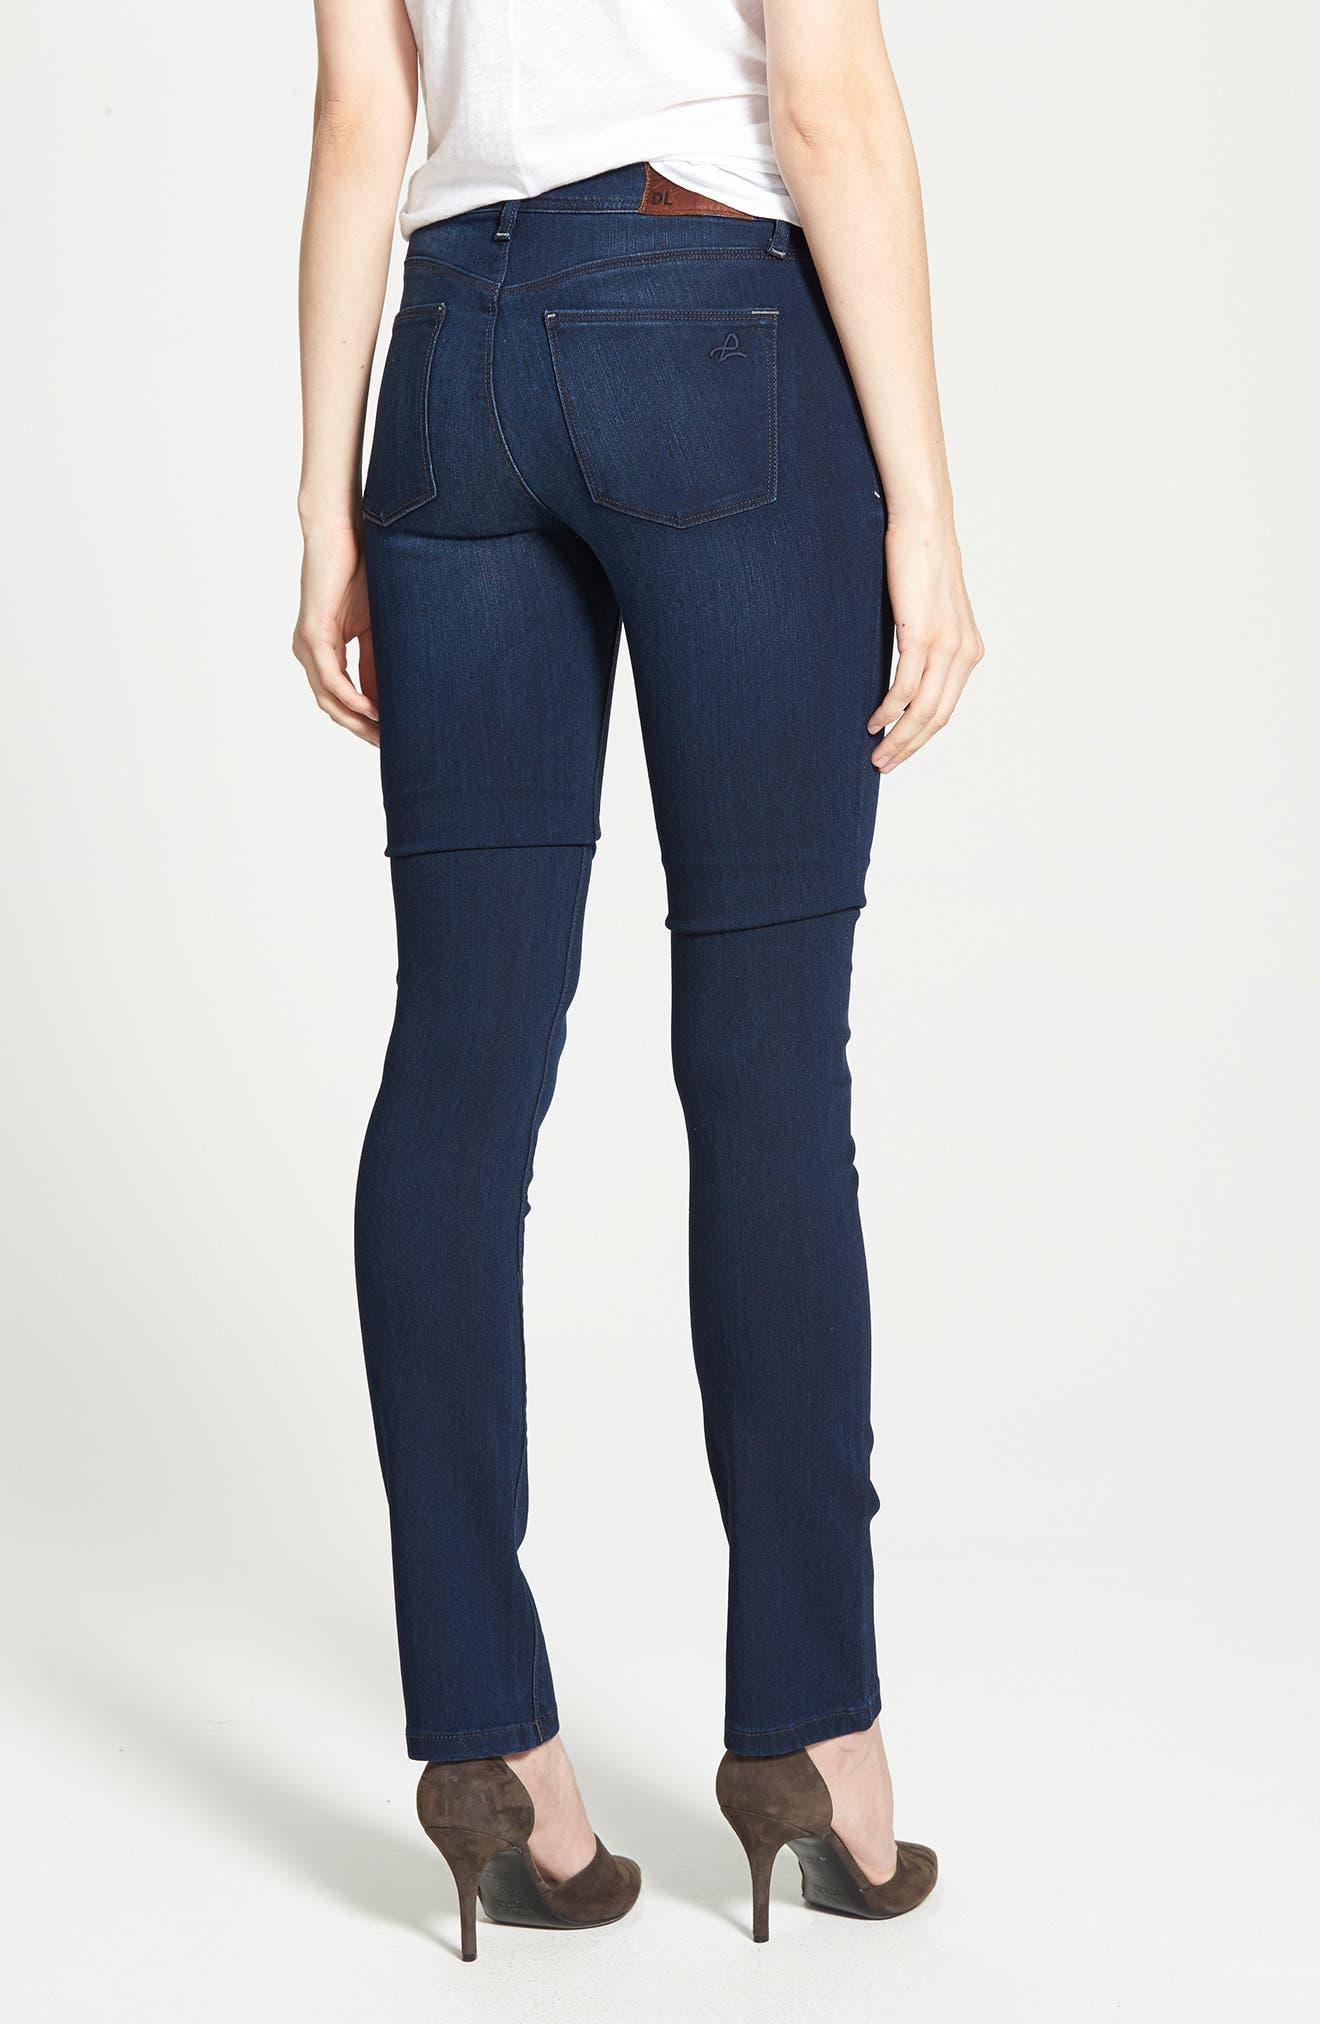 'Grace' Straight Jeans,                             Alternate thumbnail 8, color,                             405